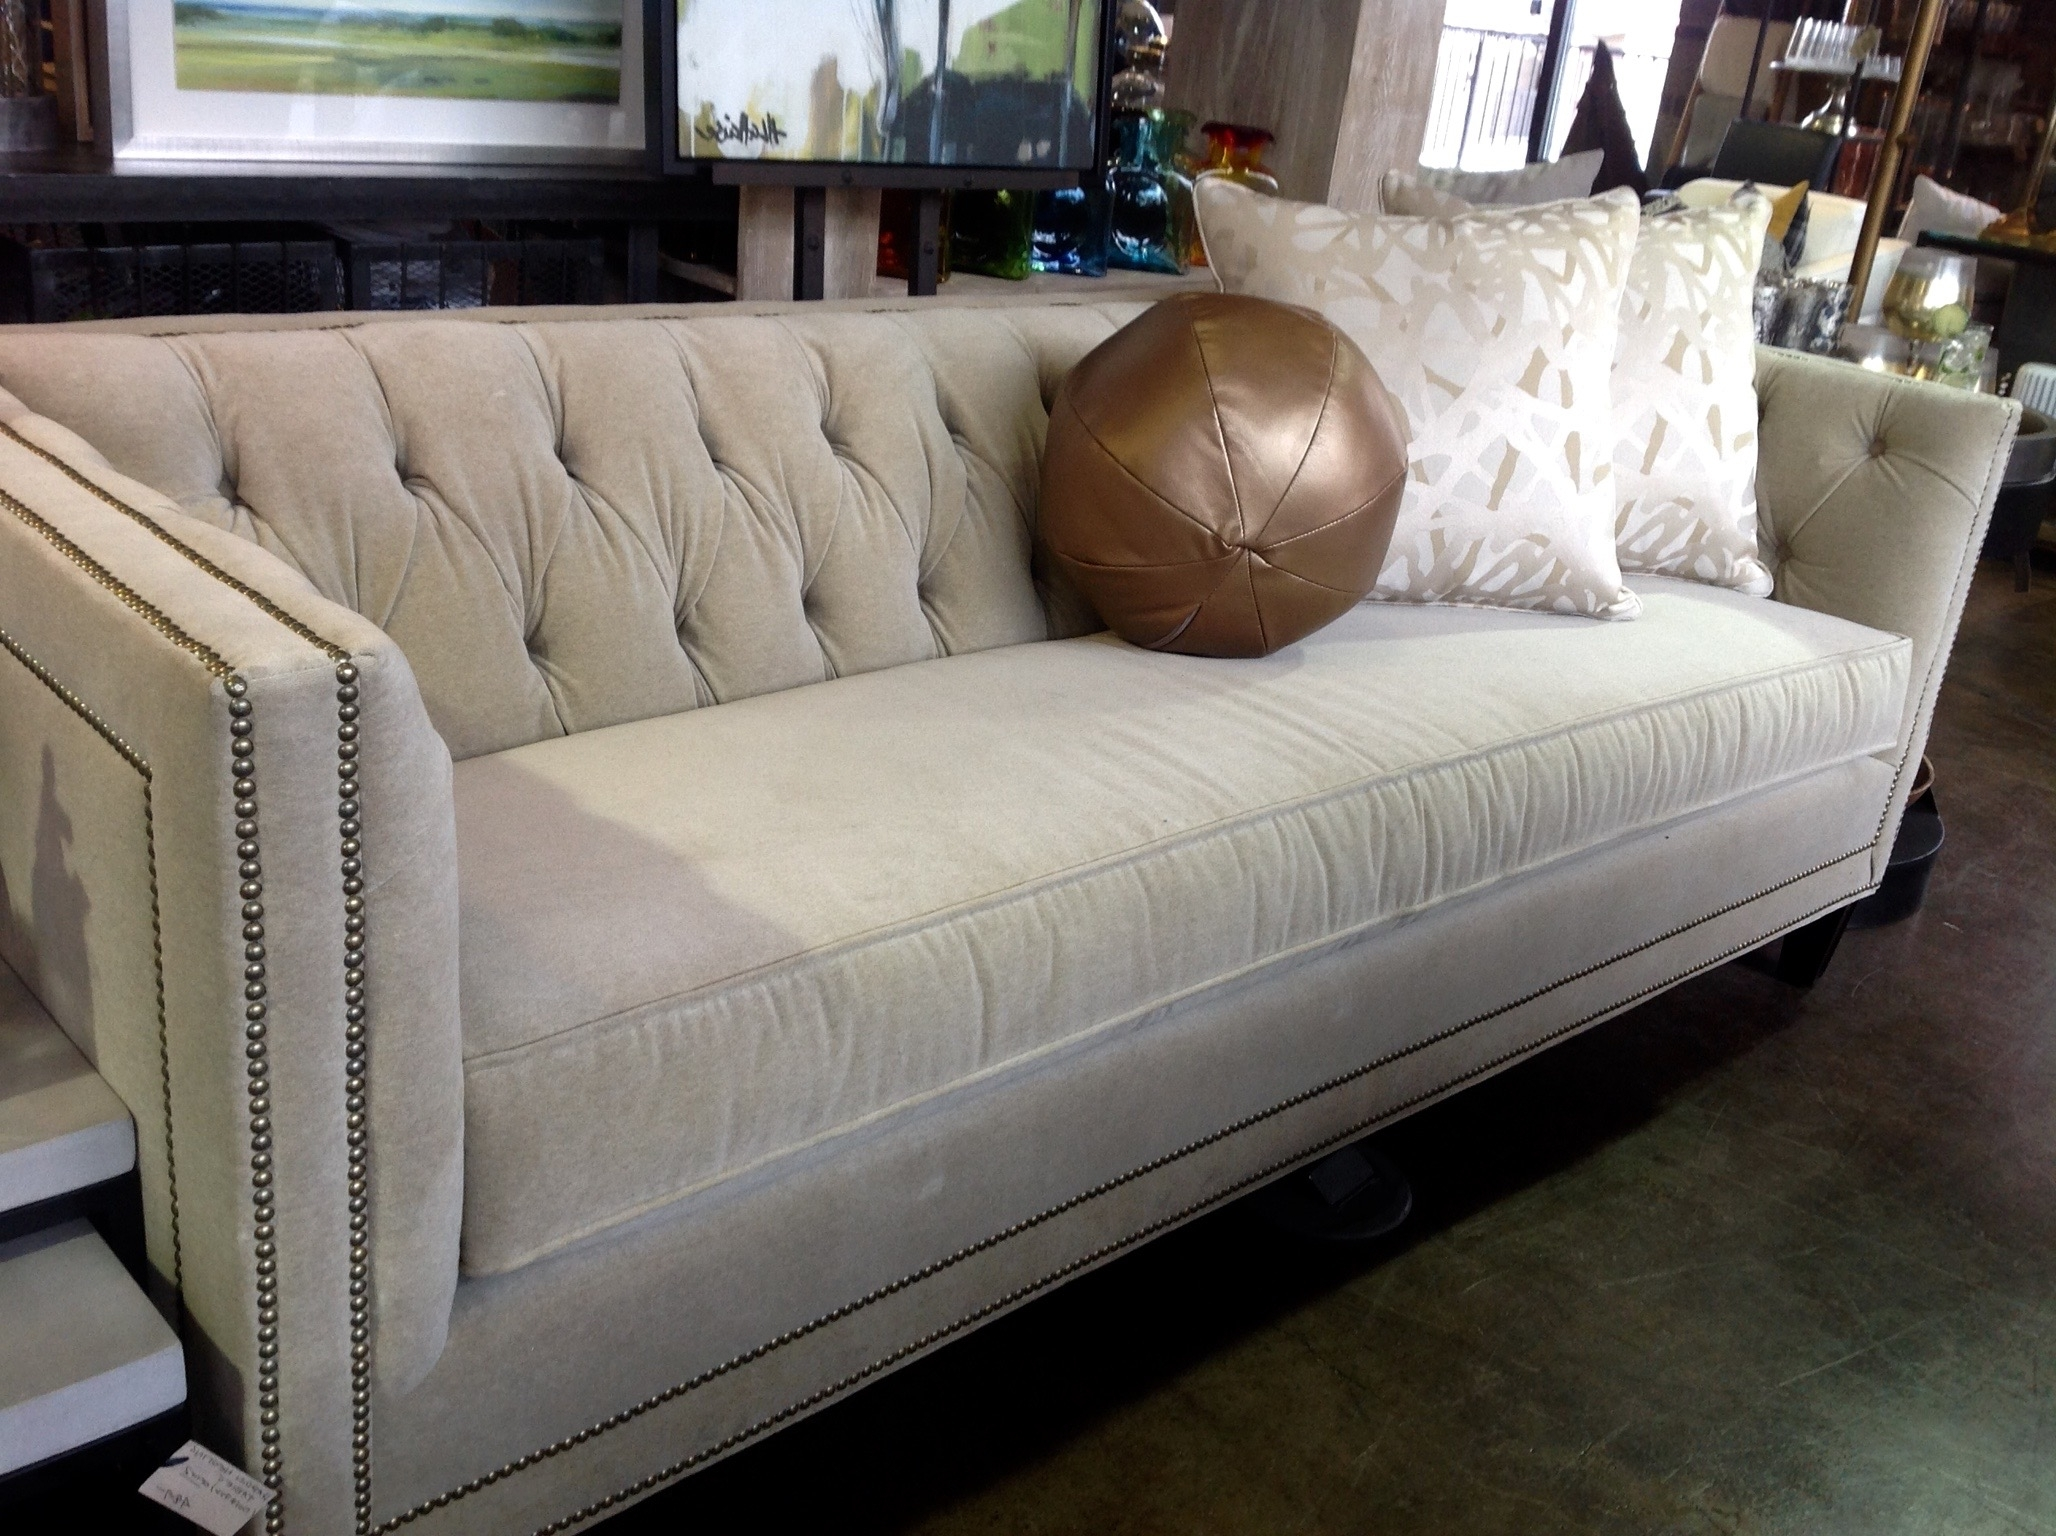 Kaden Sofa – Lulu's Furniture & Decor With Regard To Current Norwalk Sofas (View 4 of 20)